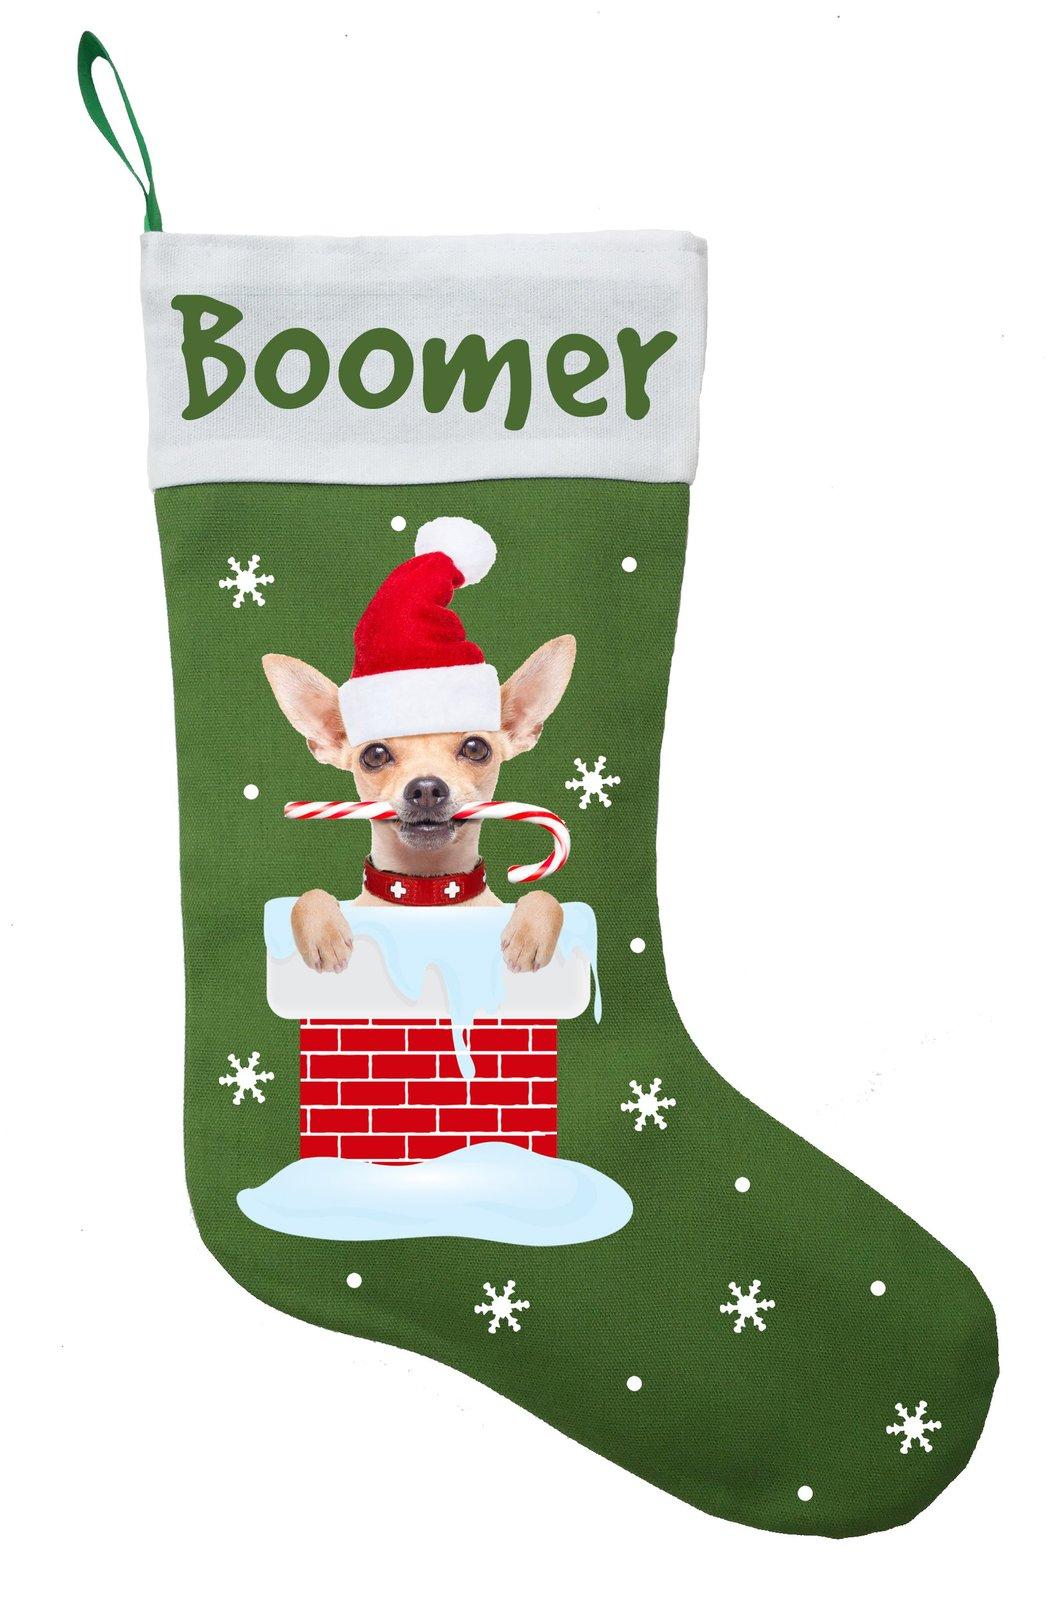 Chihuahua Christmas Stocking - Personalized Chihuahua Stocking - Green